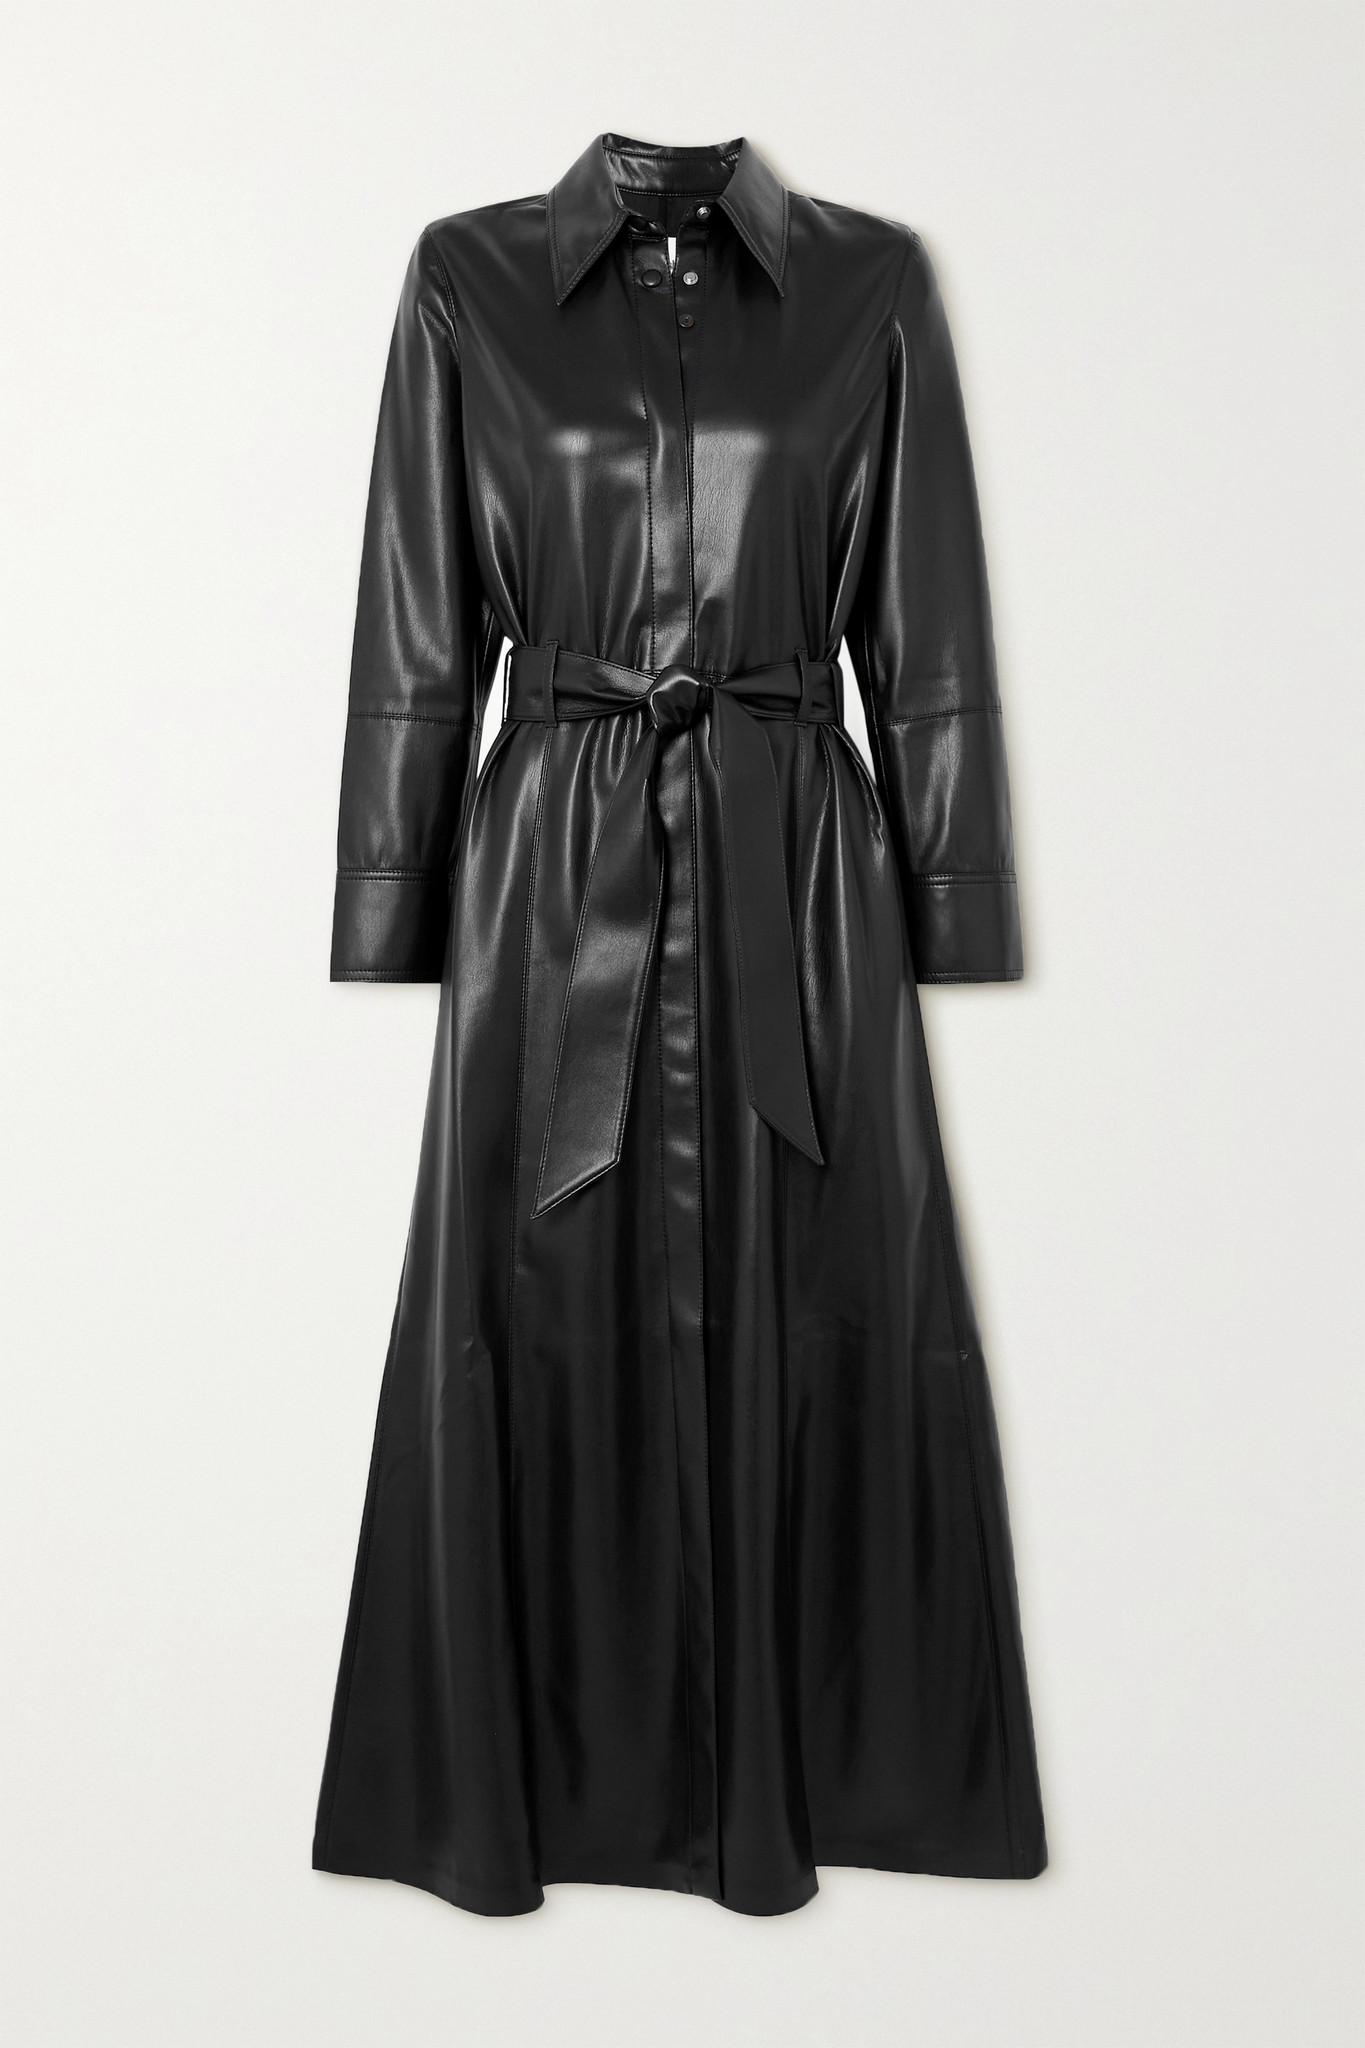 NANUSHKA - Asayo 配腰带纯素皮革衬衫式中长连衣裙 - 黑色 - x small